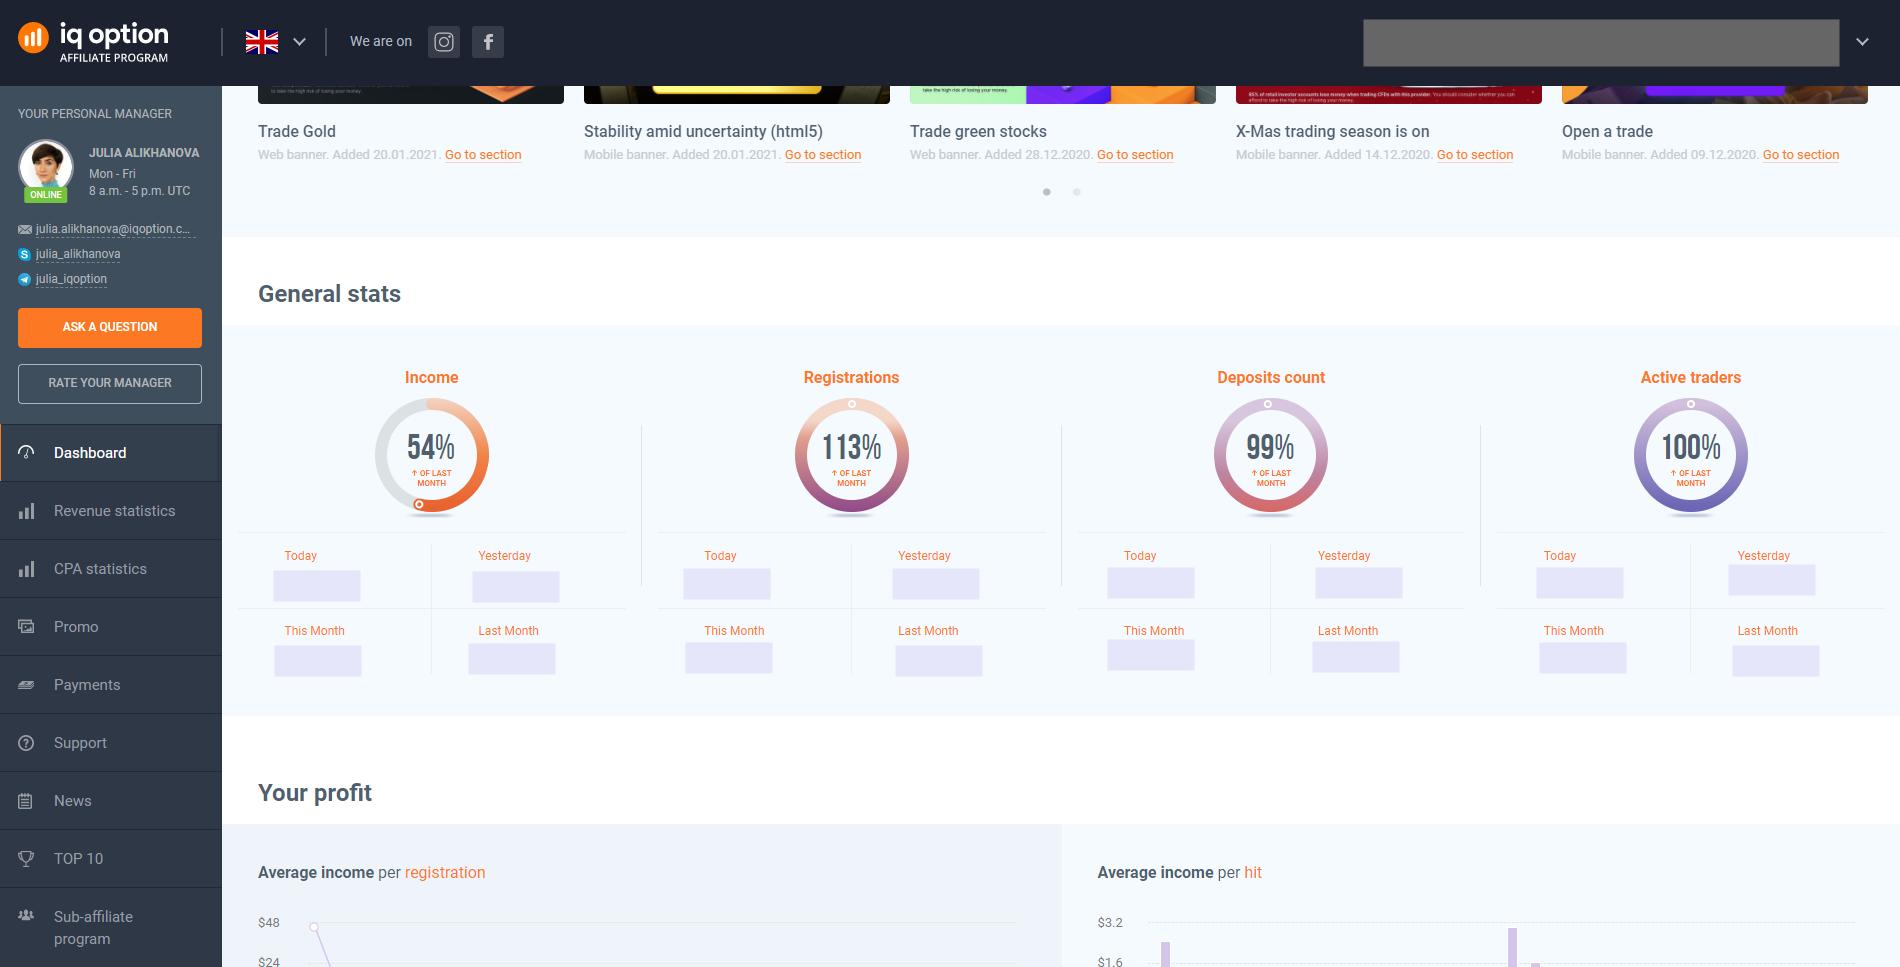 Dashboard of the IQ Option affiliate program